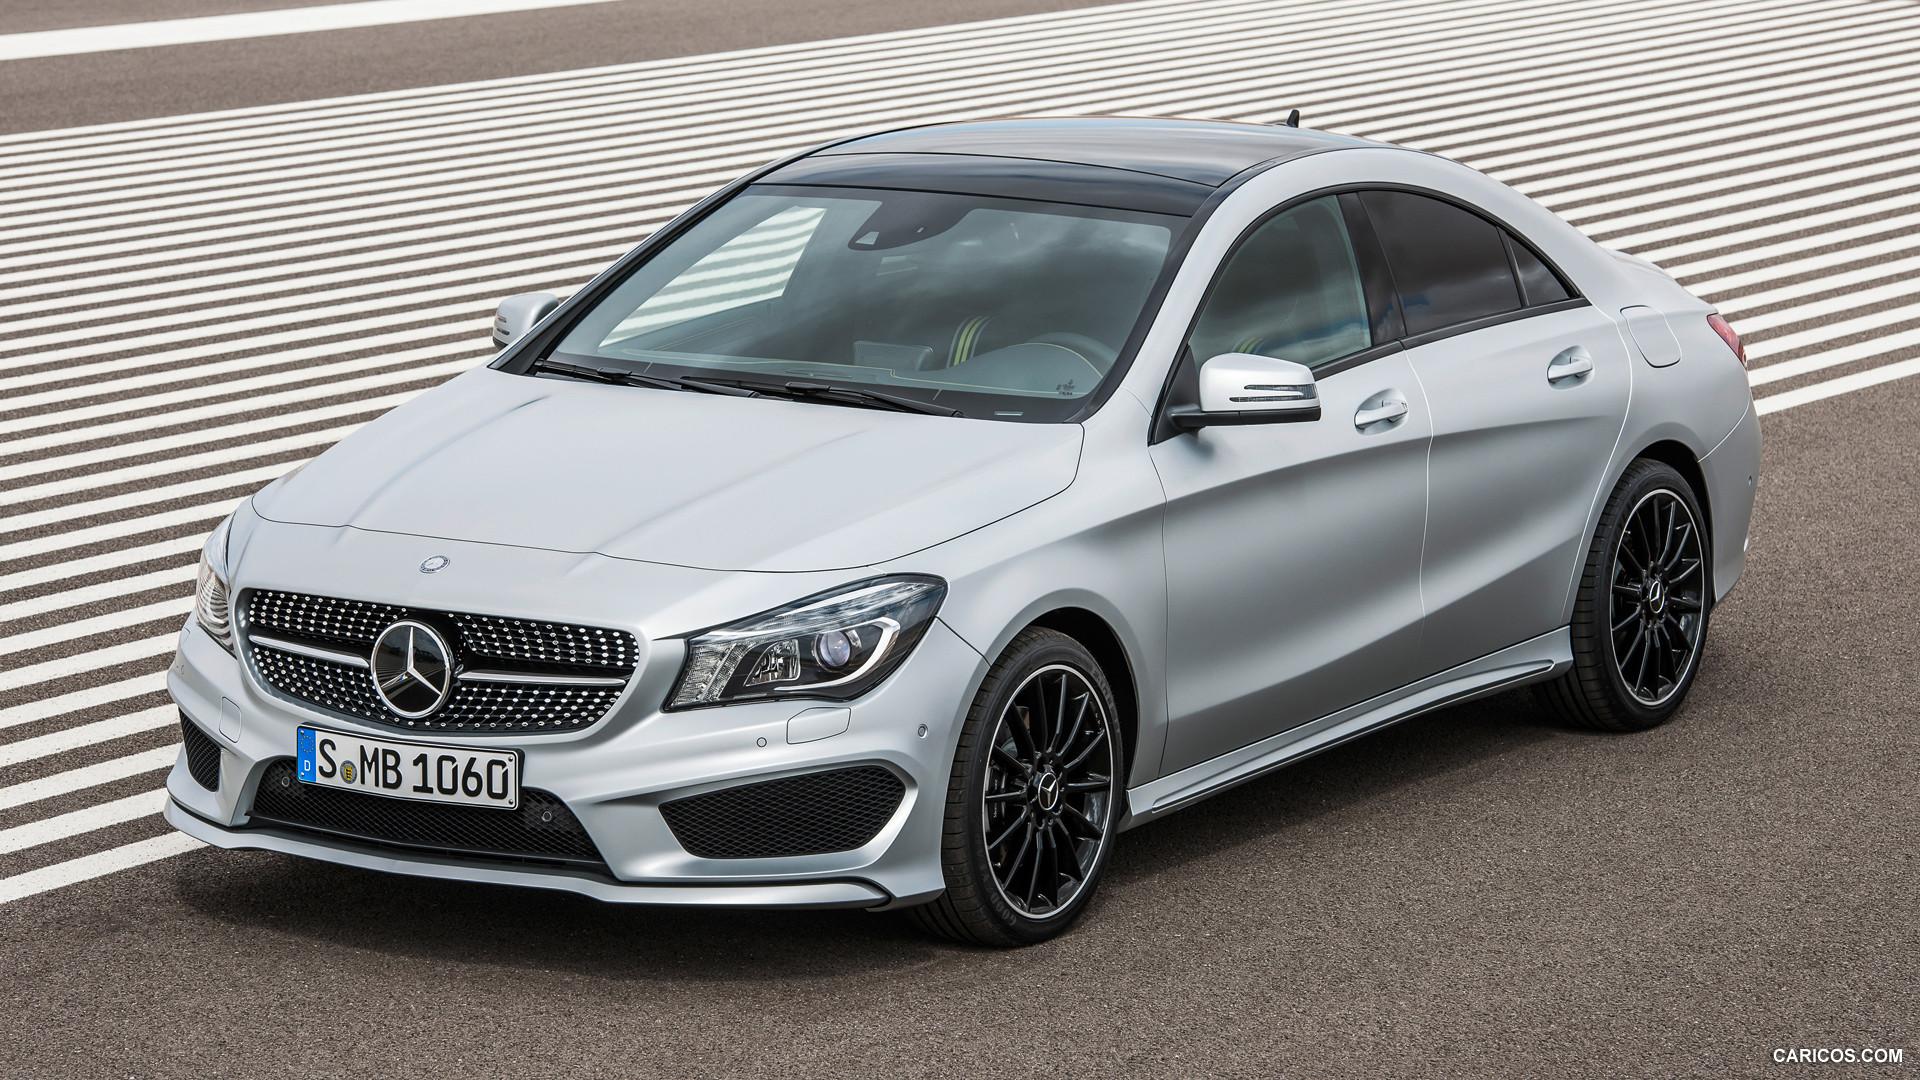 2014 Mercedes Benz Cla Class Information And Photos